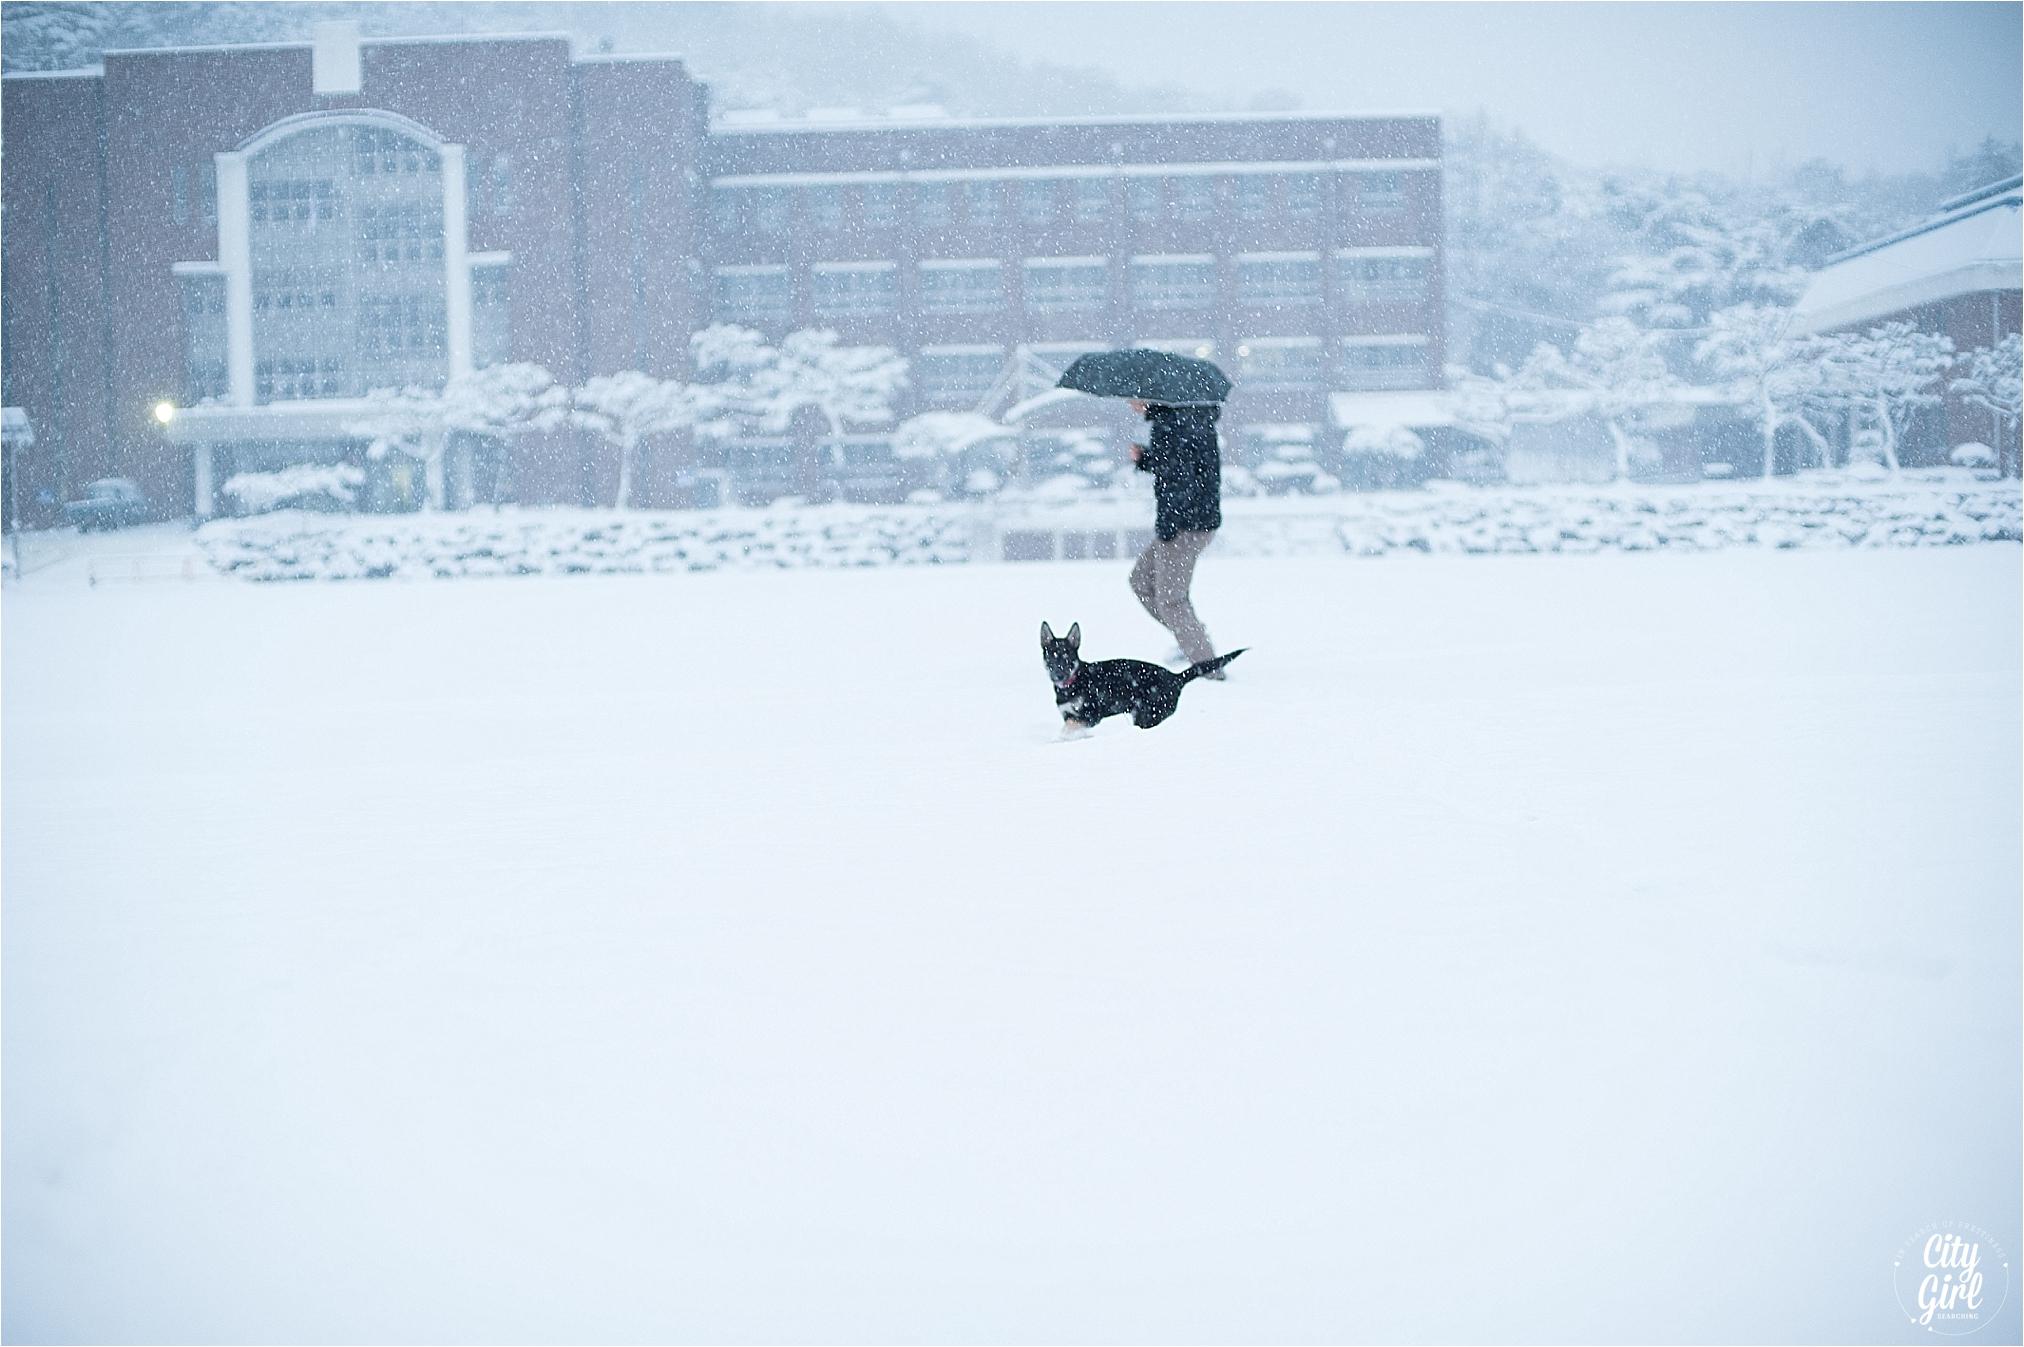 SnowInKorea_0012.jpg